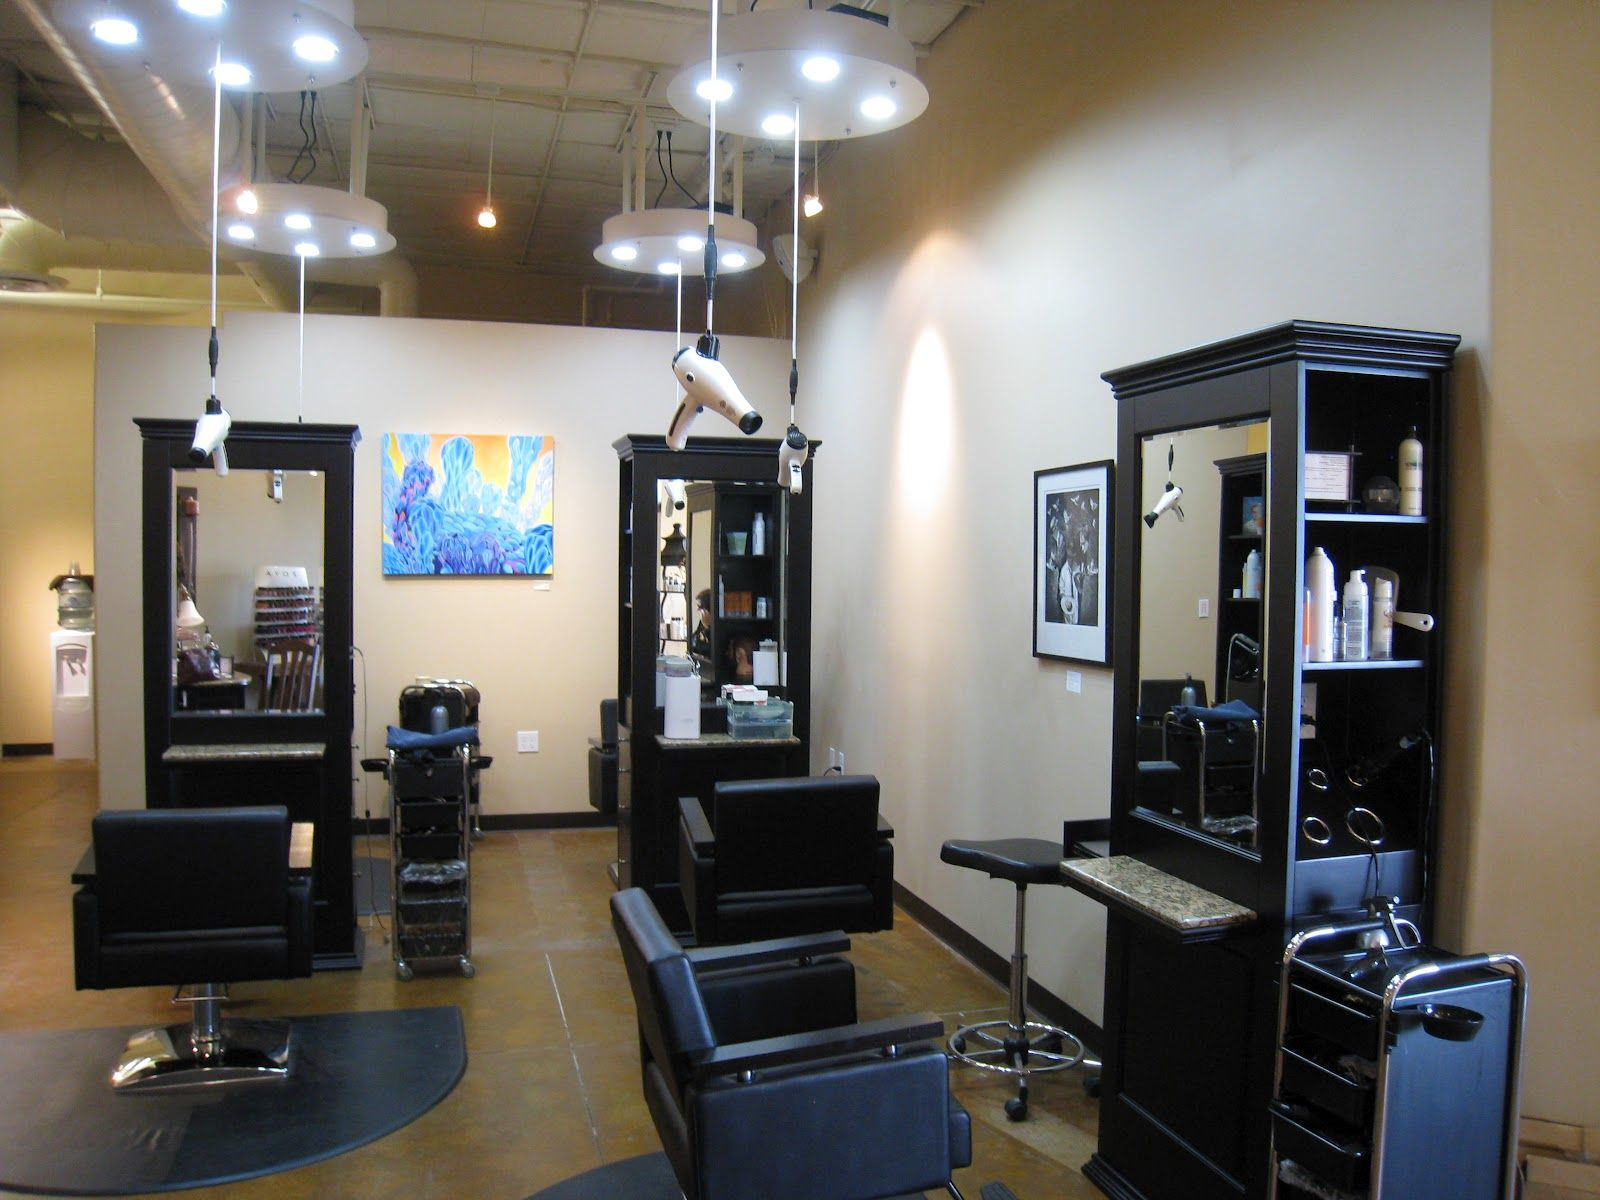 17 Benefits Of Beauty Salon  Salon interior design, Hair salon